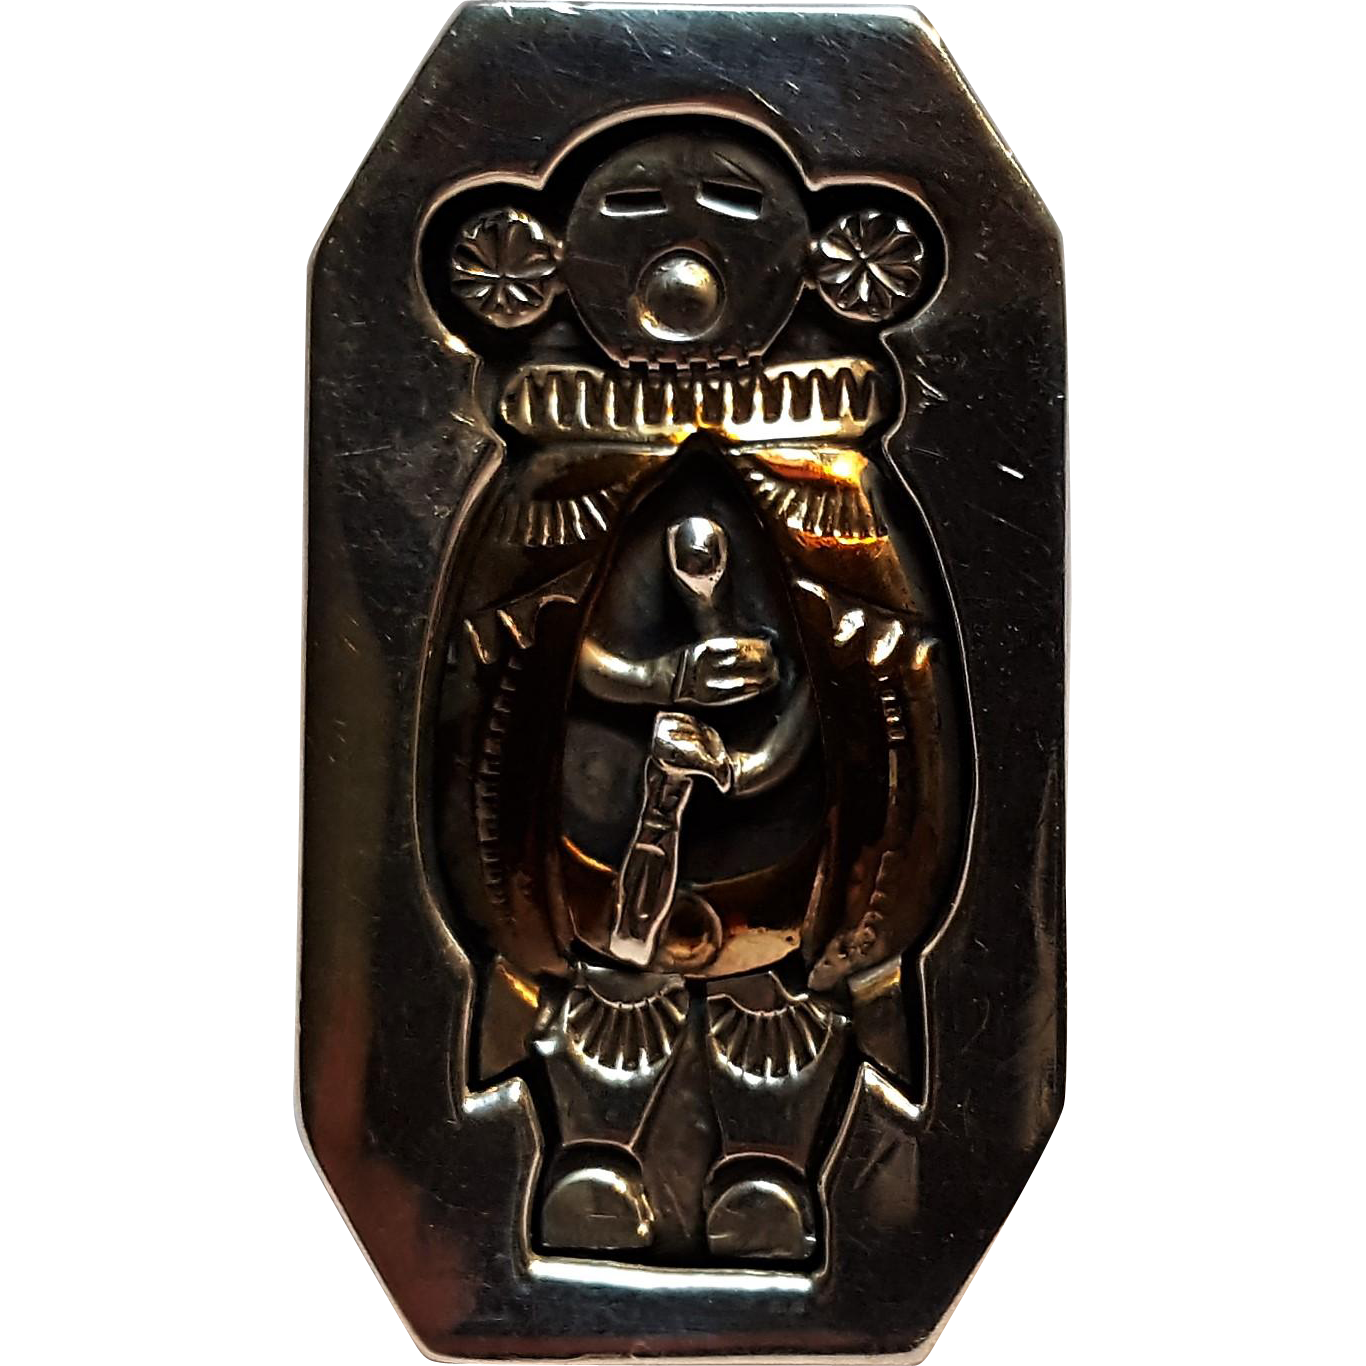 Wes Craig Navajo ring sterling 12K gf medicine man shadow box